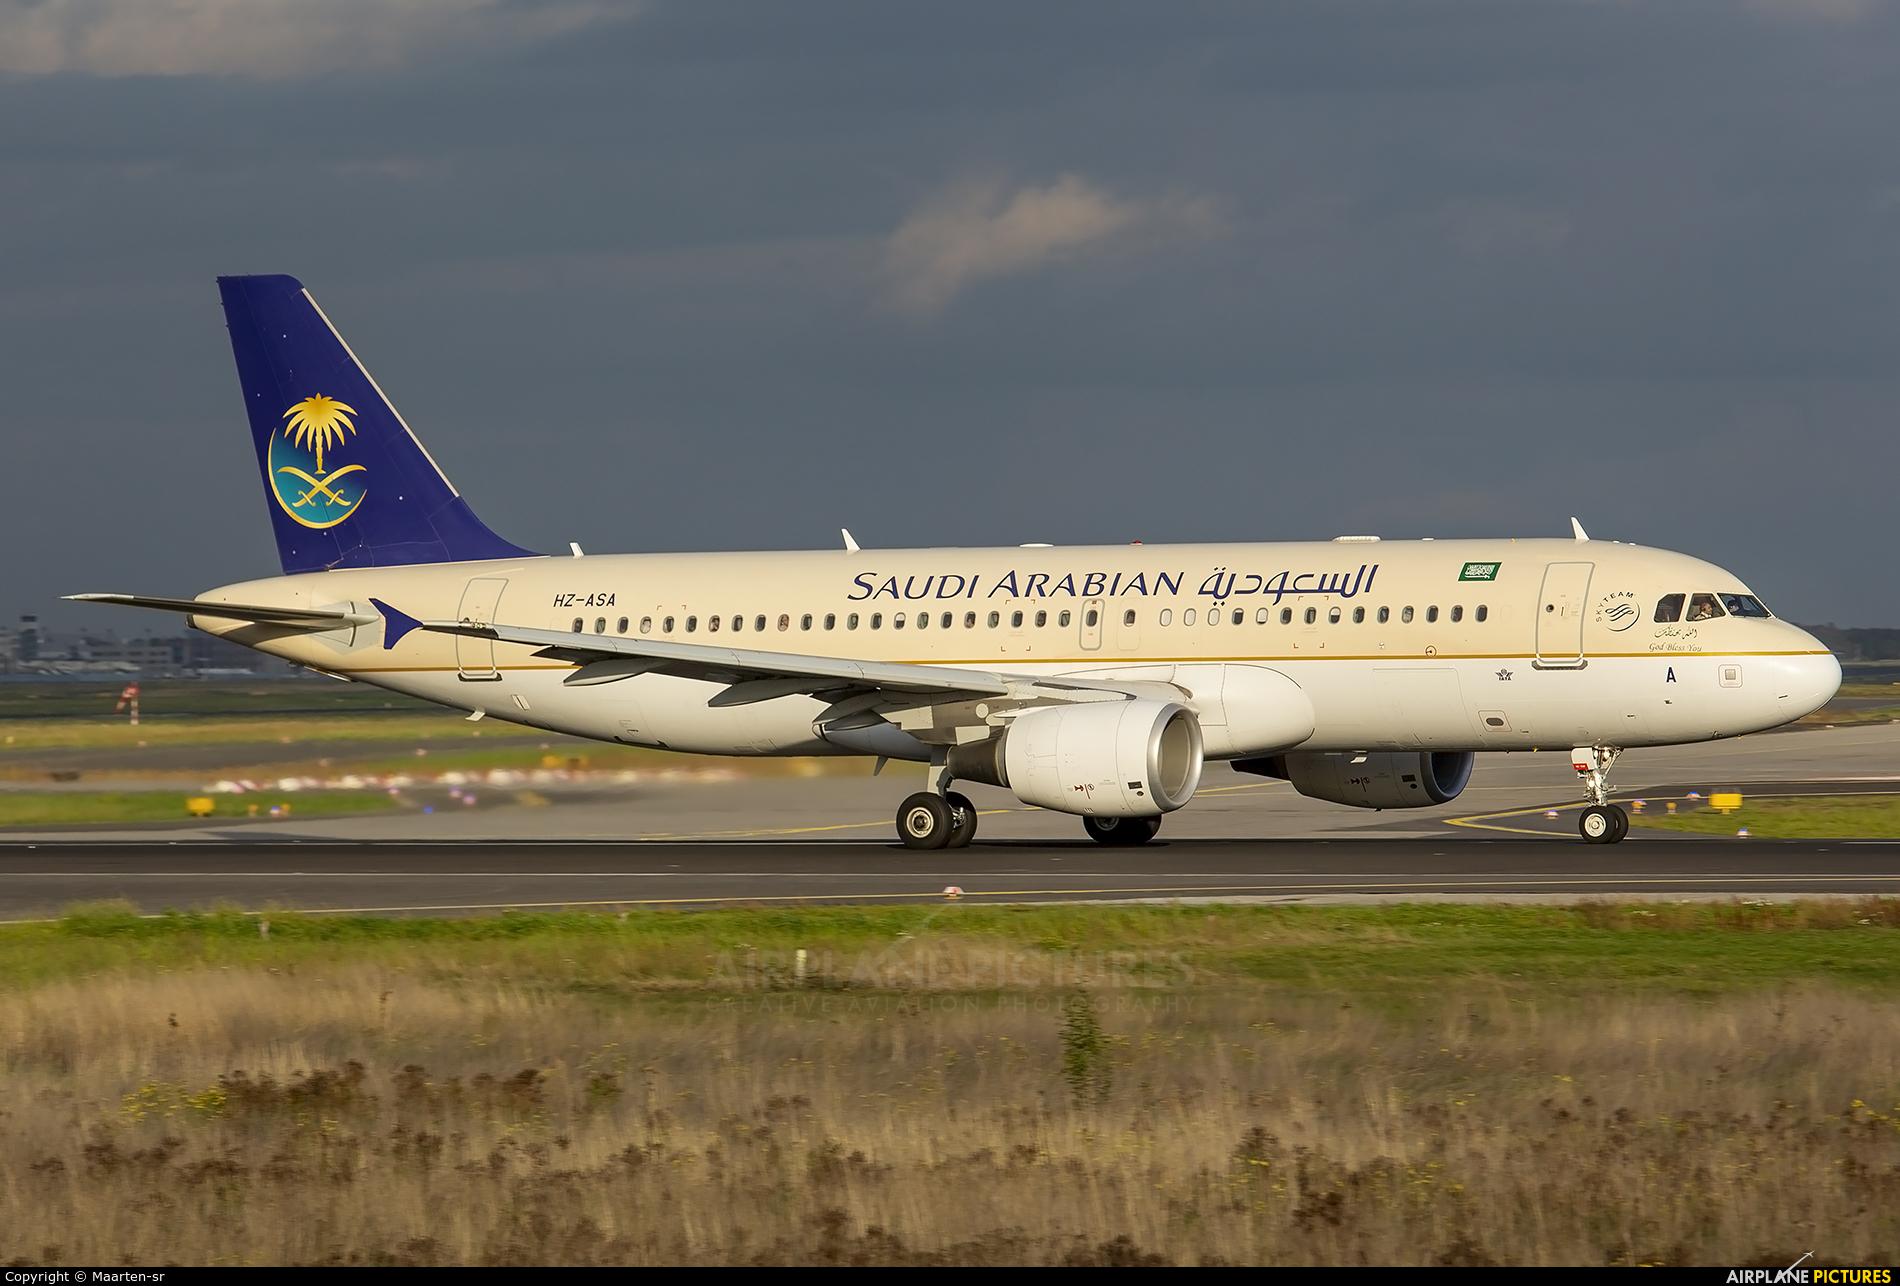 Saudi Arabian Airlines HZ-ASA aircraft at Frankfurt